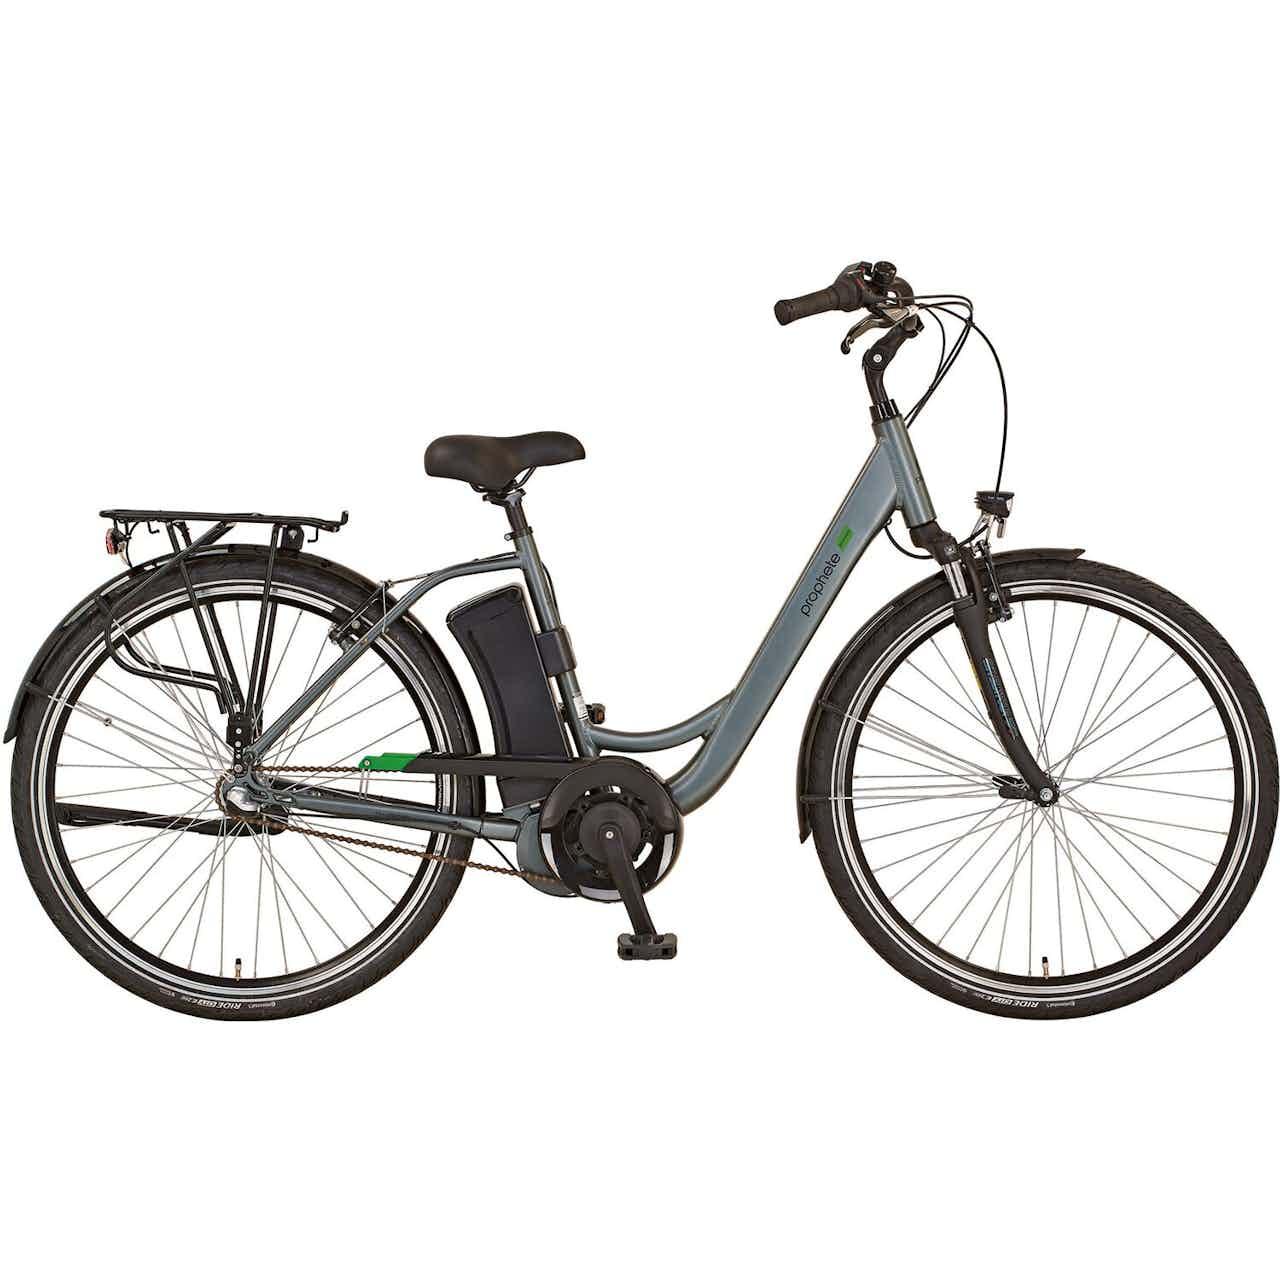 "Prophete E-Bike Unisex City-Fahrrad 28"" Genießer 20.EMC.20"